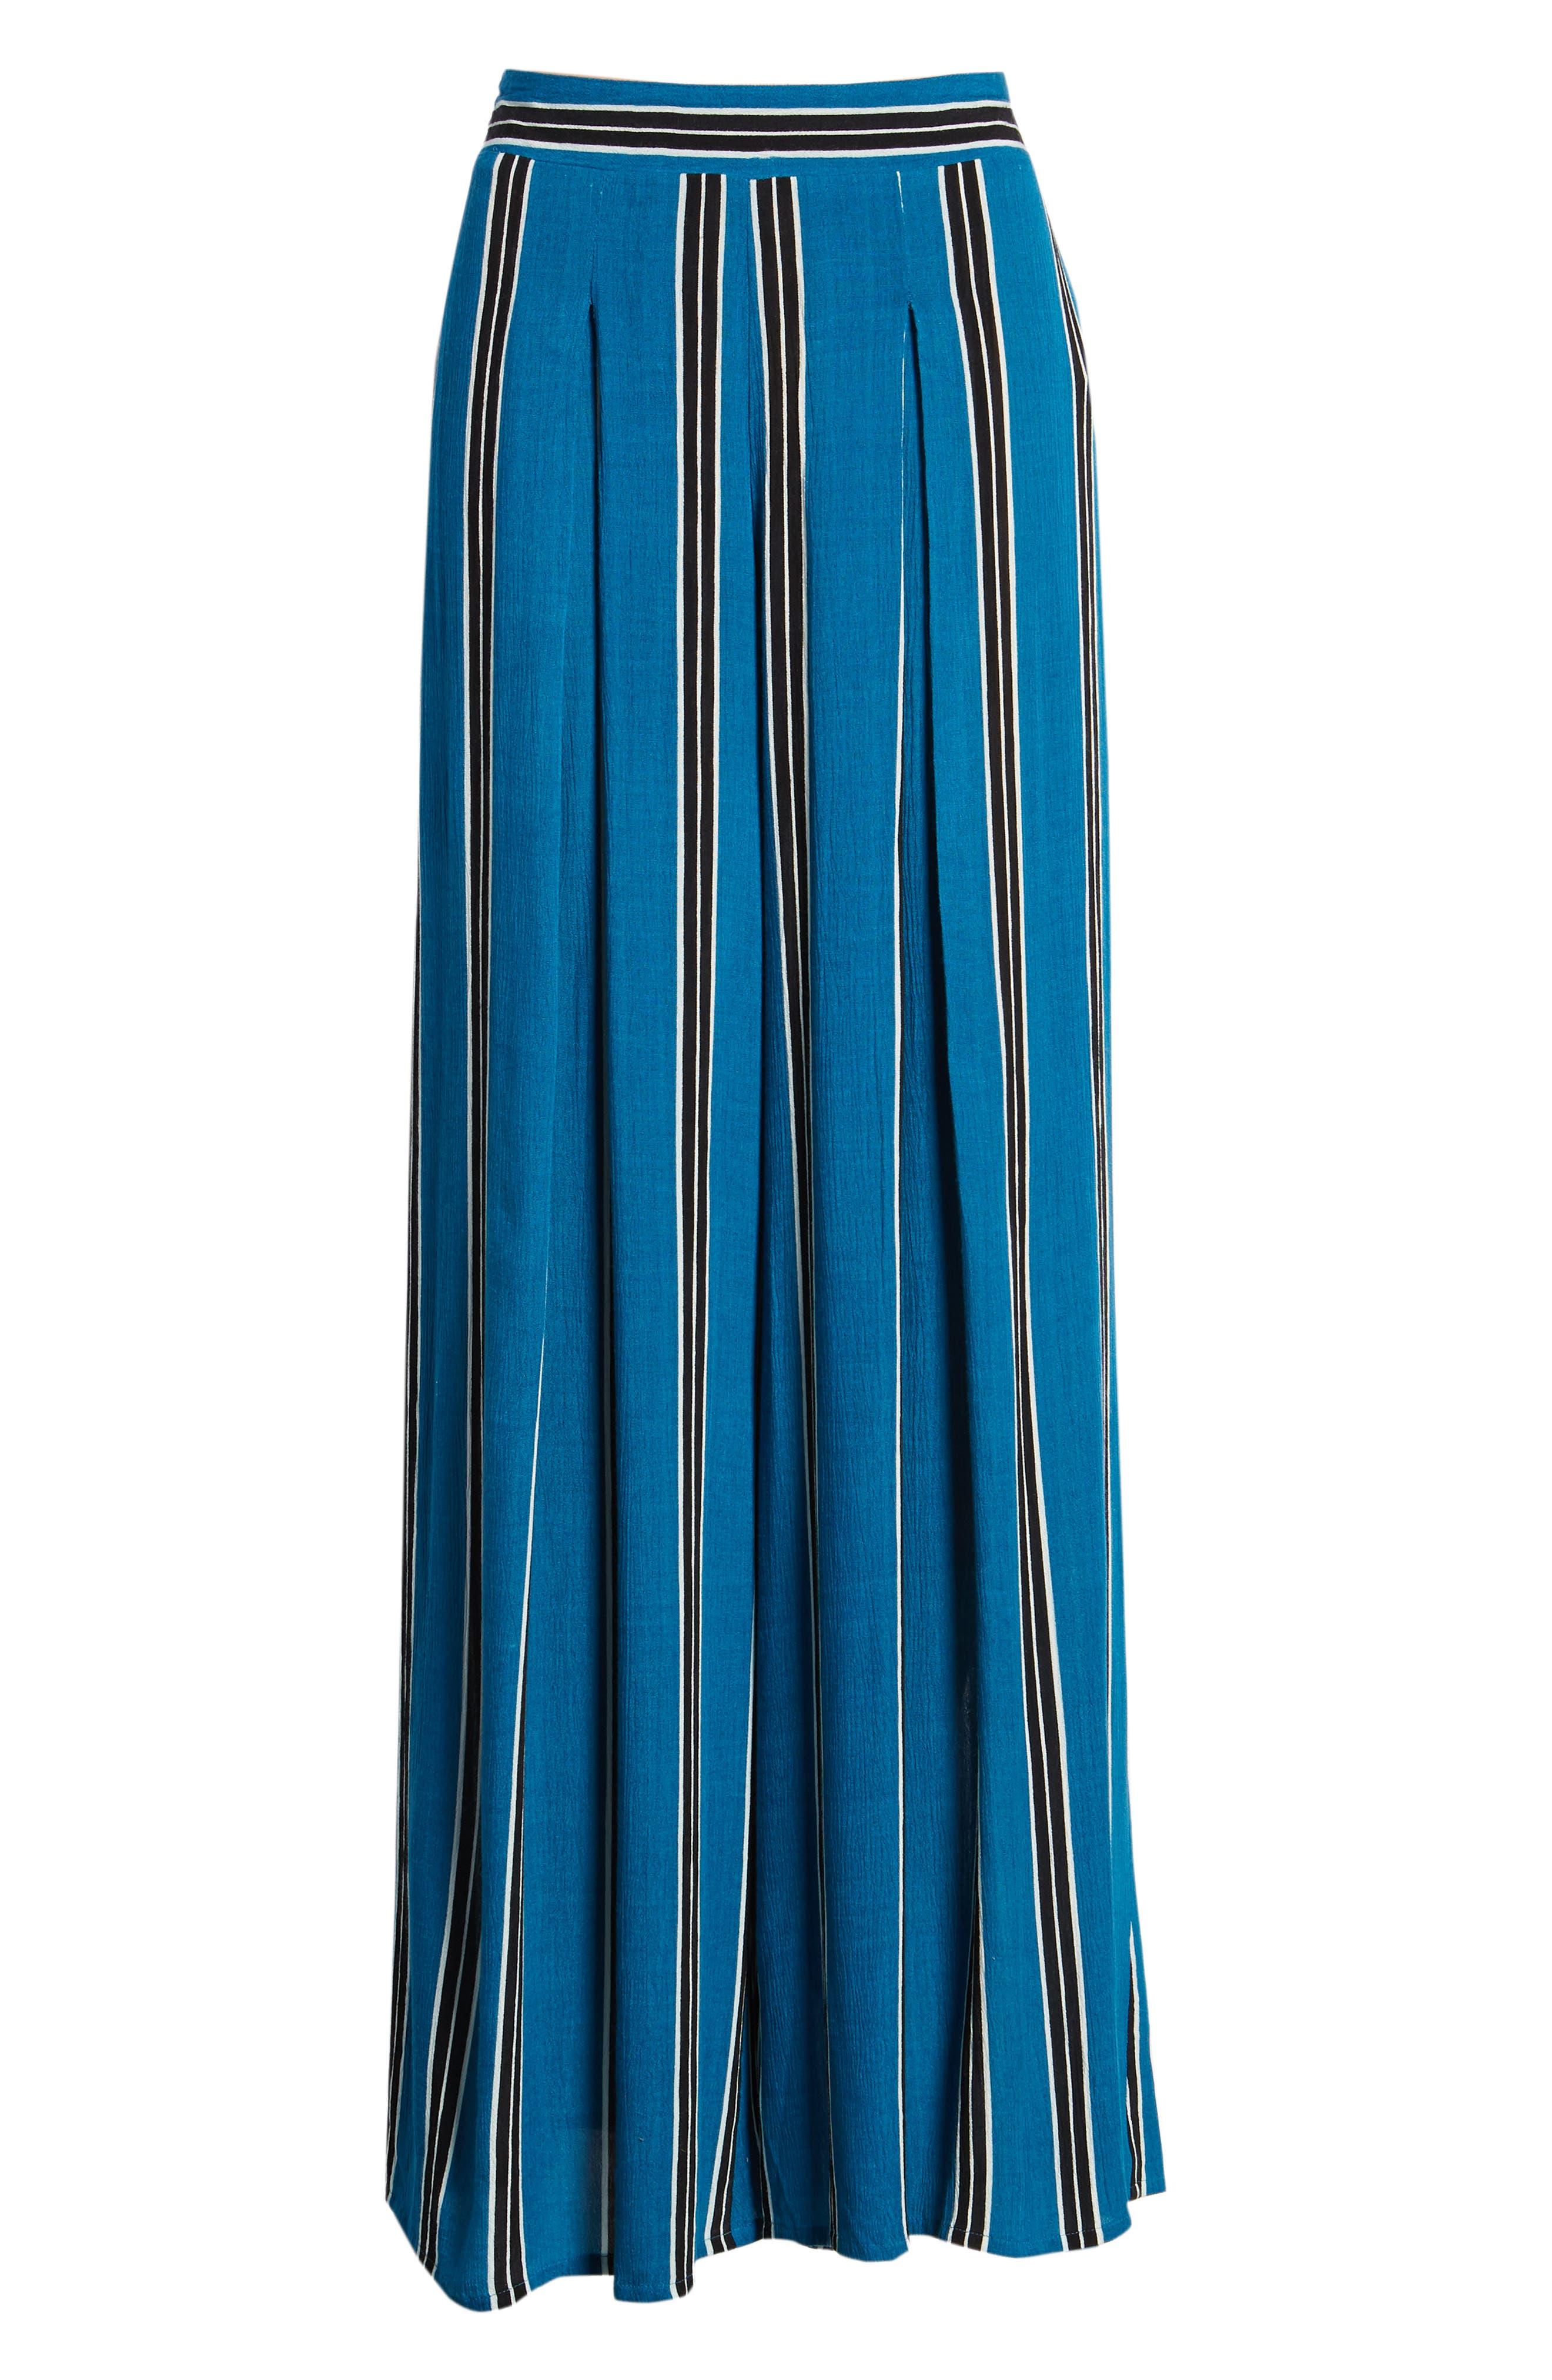 Stripe Wide Leg Pants,                             Alternate thumbnail 8, color,                             Blue/ Black